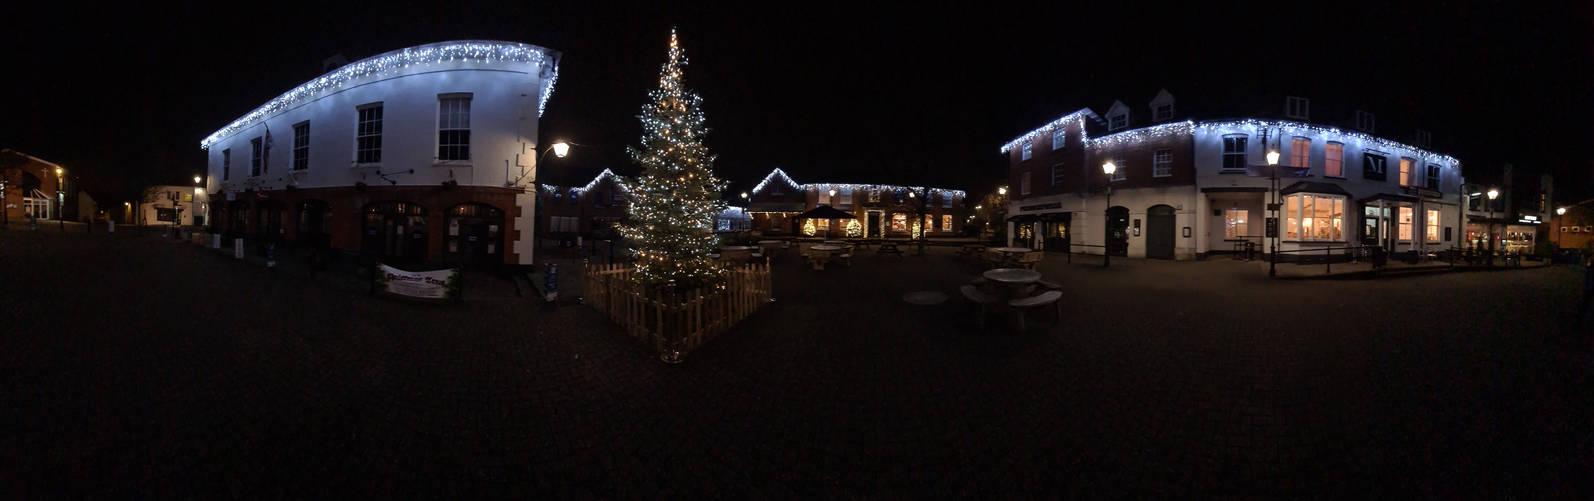 Market Square Panorama